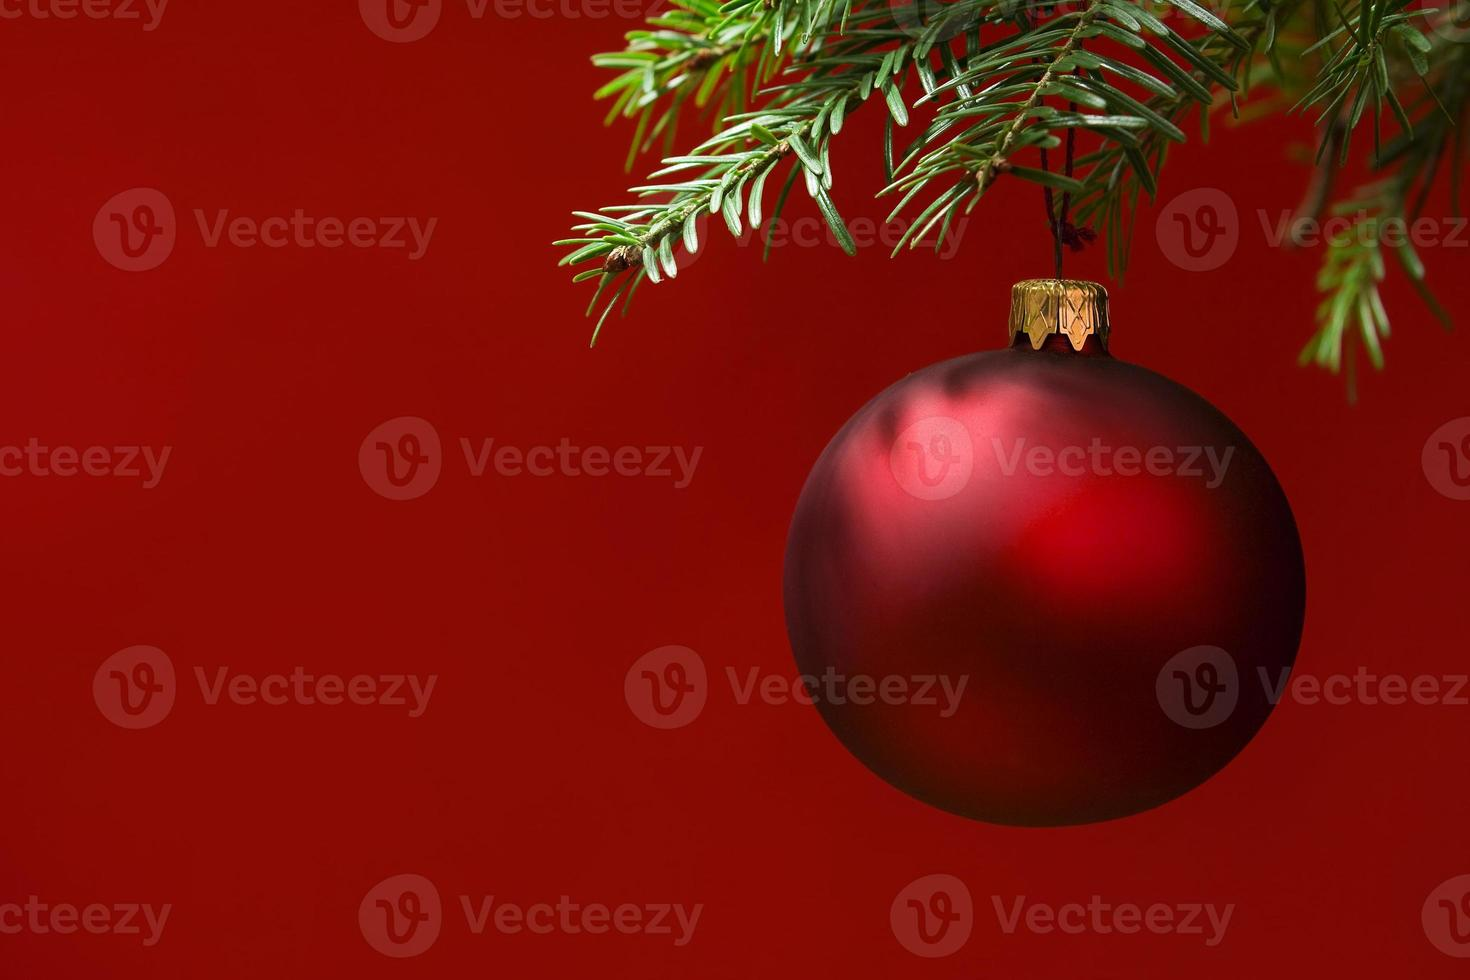 Tarjeta de Navidad con adornos de adorno rojo. fondo rojizo foto